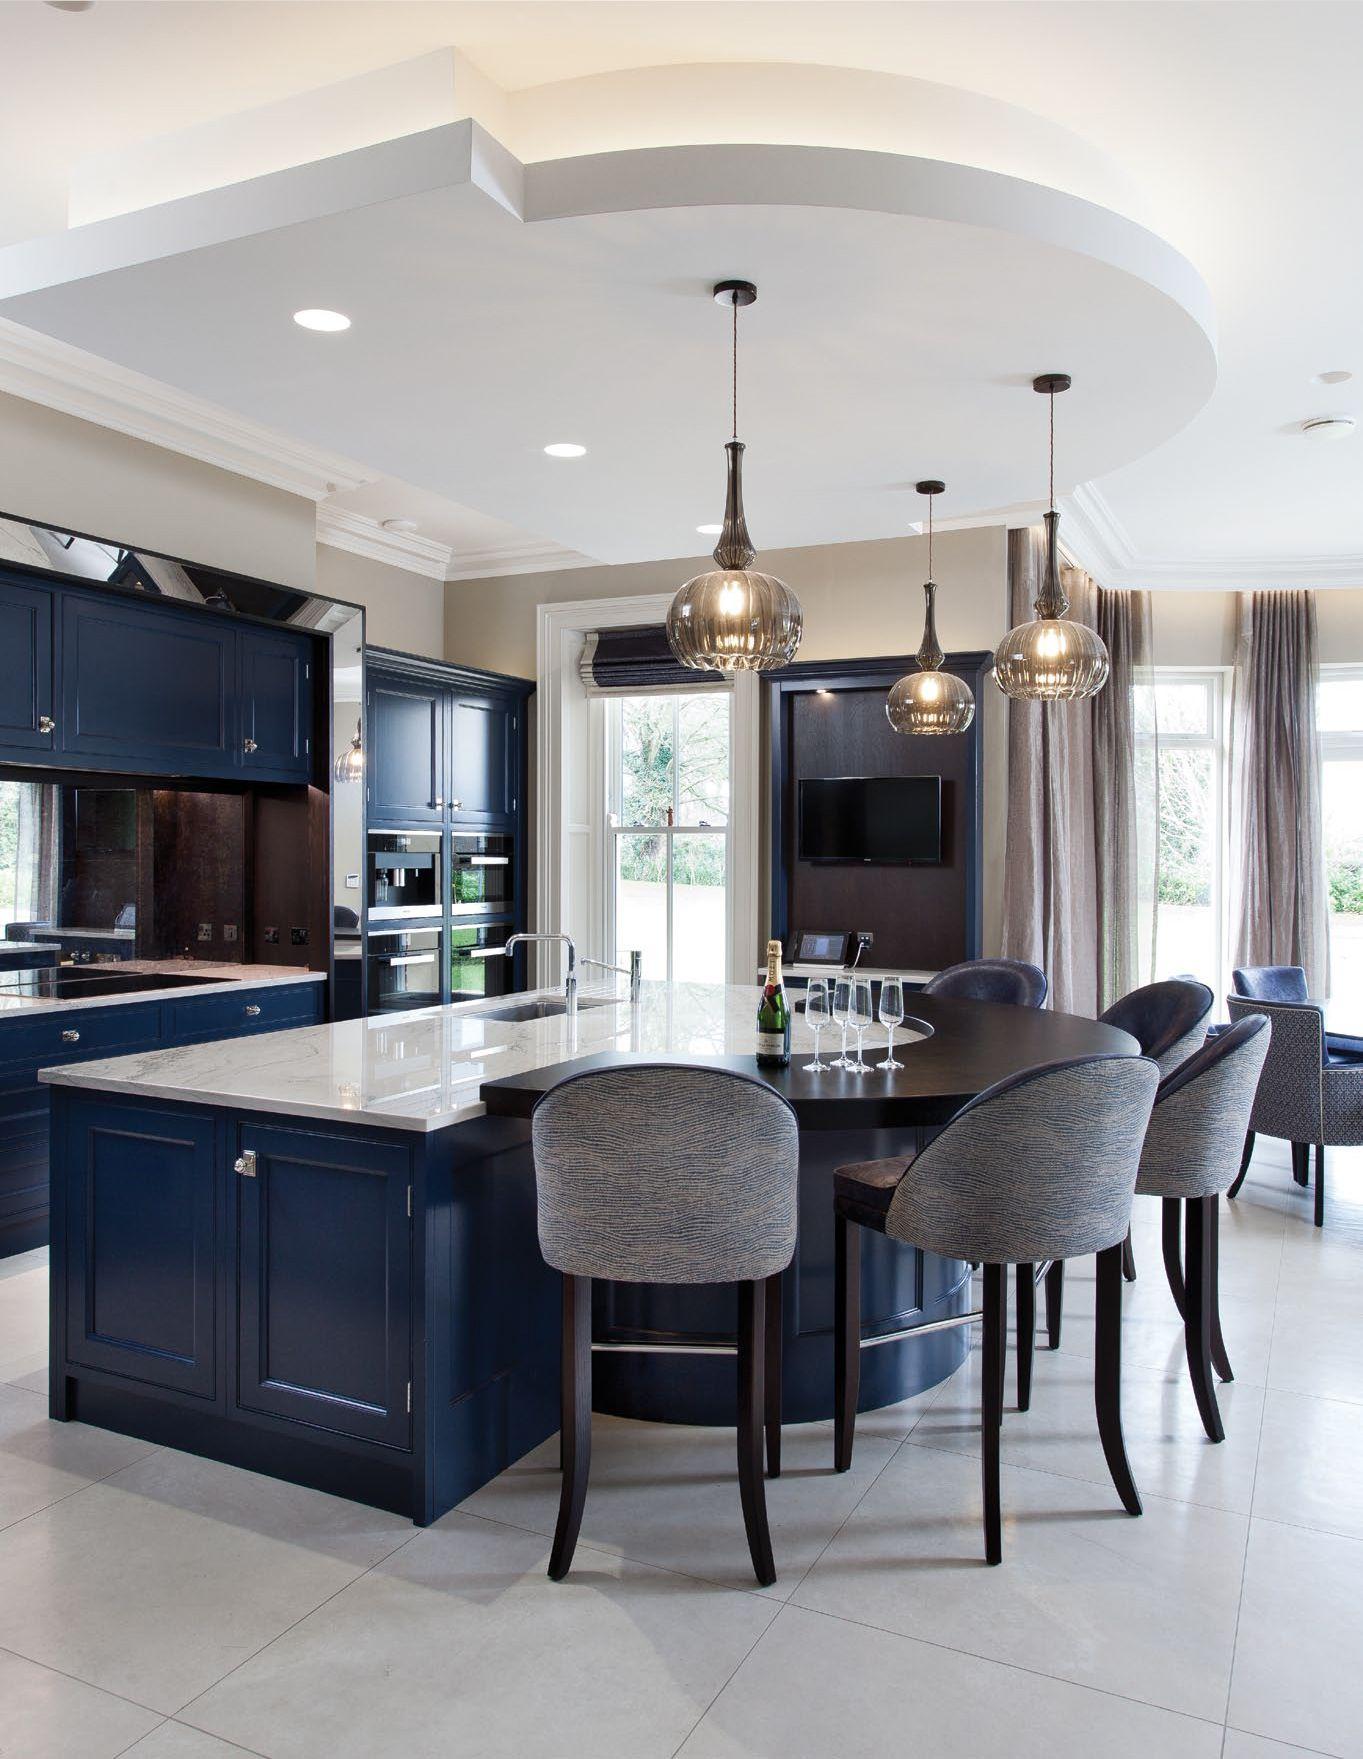 Pin Caeliegh Benson Future Home In 2019 Luxury